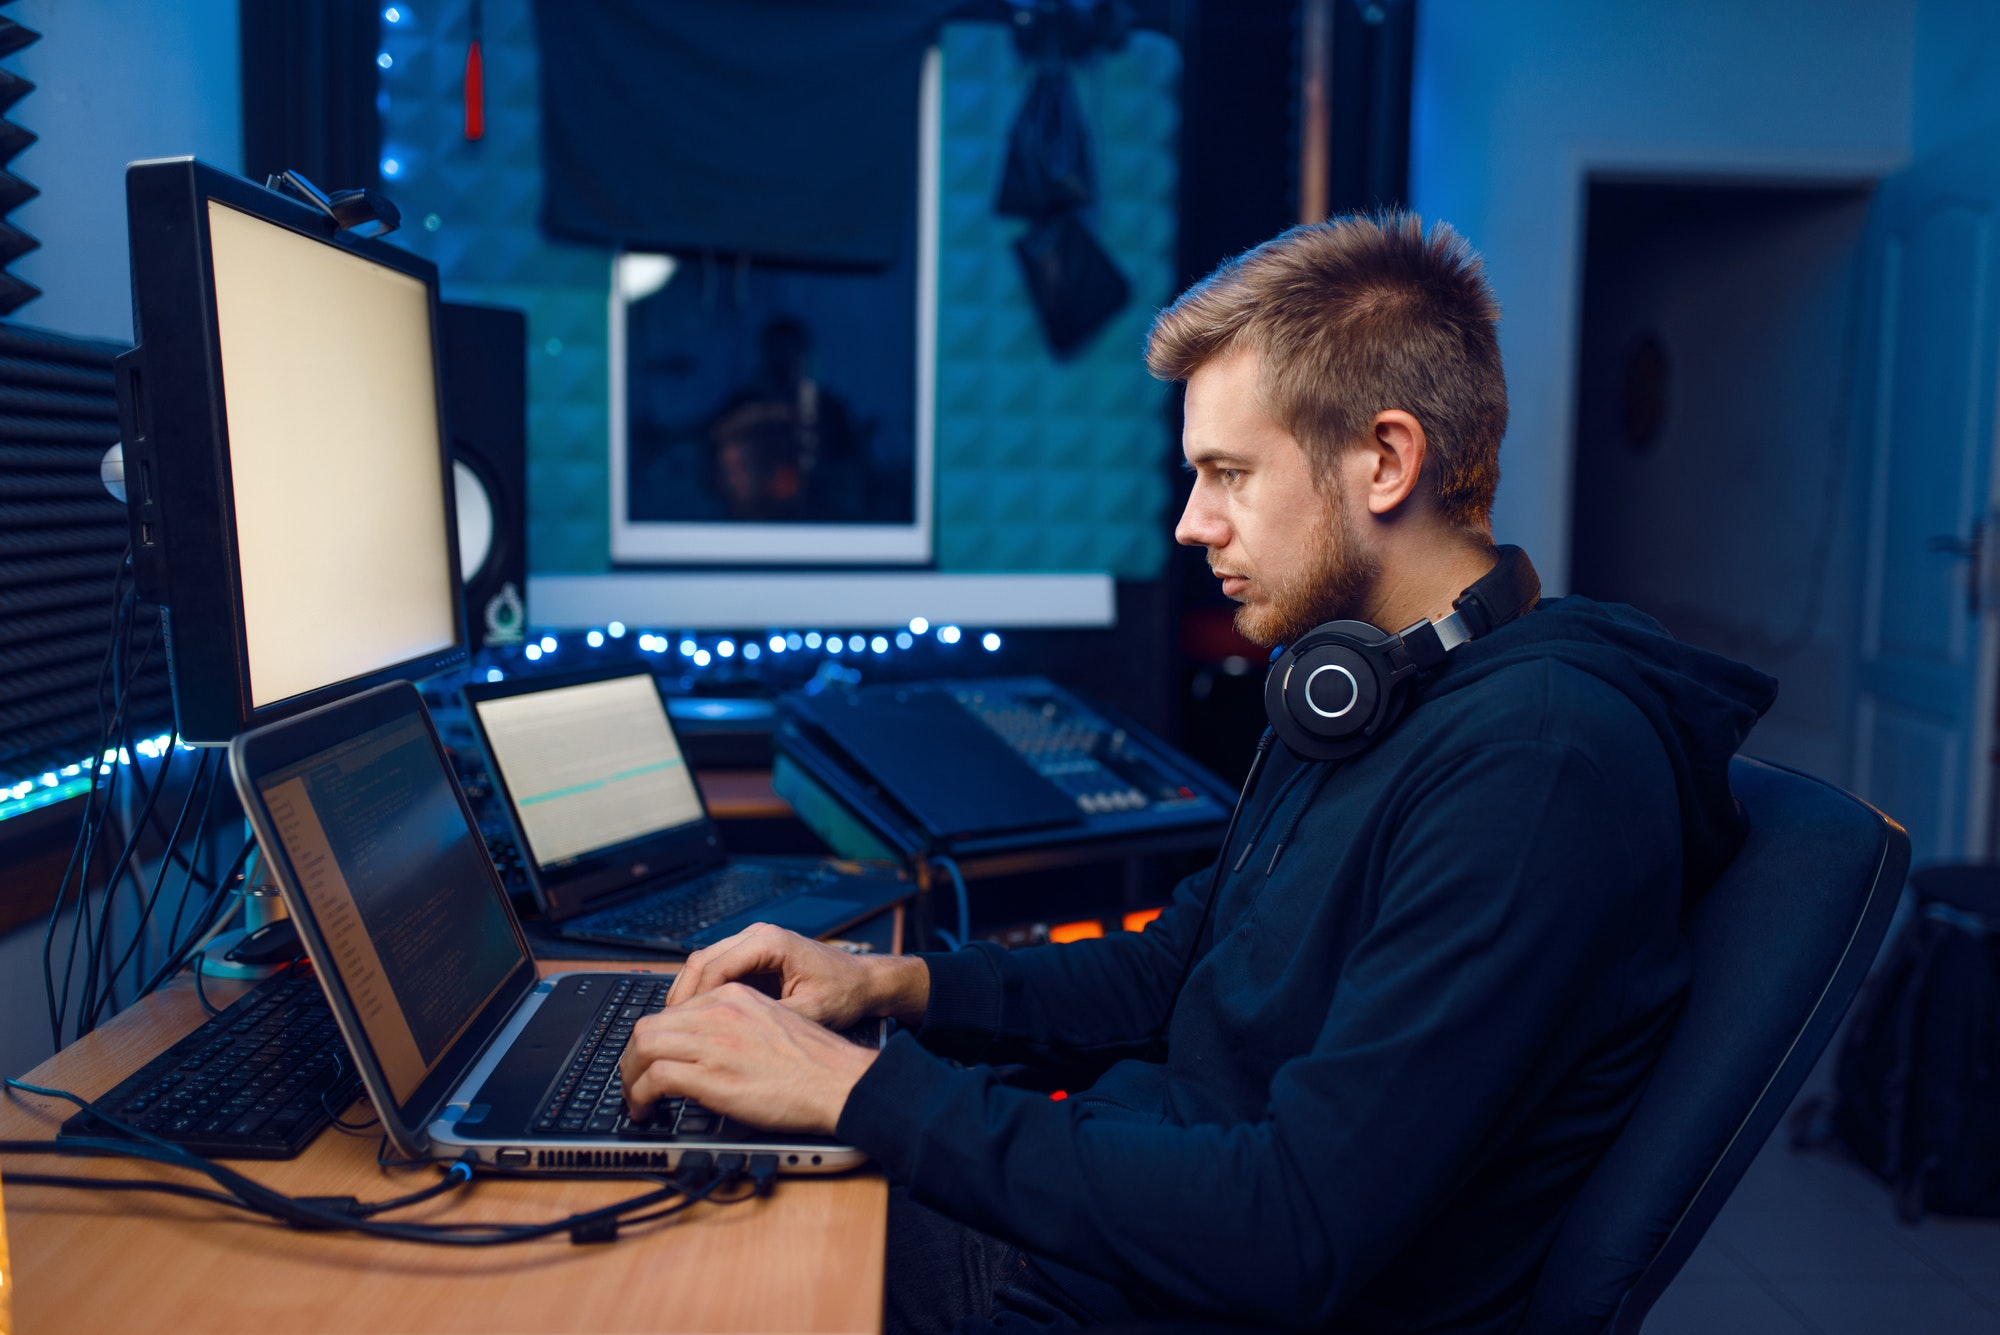 Programmer working on laptop, computer technology